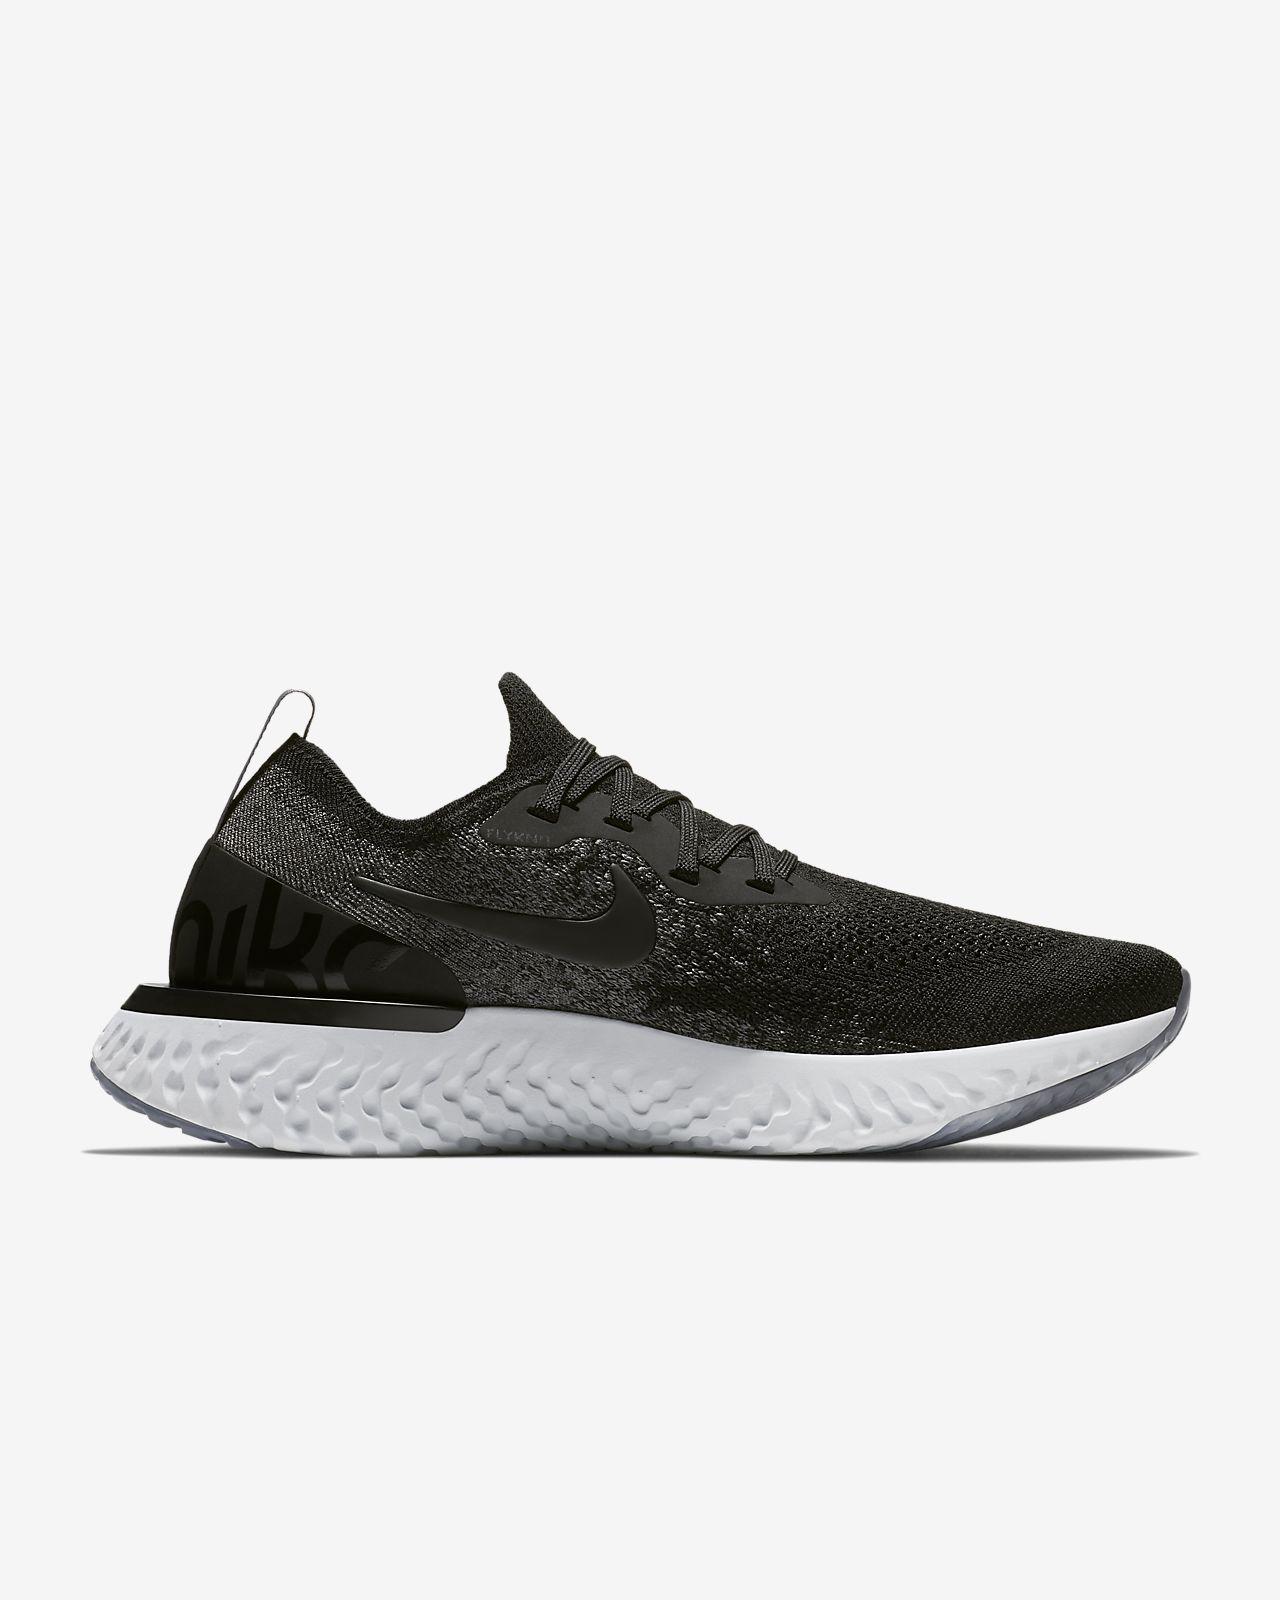 Nike Epic React Flyknit - Damen Schuhe Black Größe 37.5 oFCE8tkv